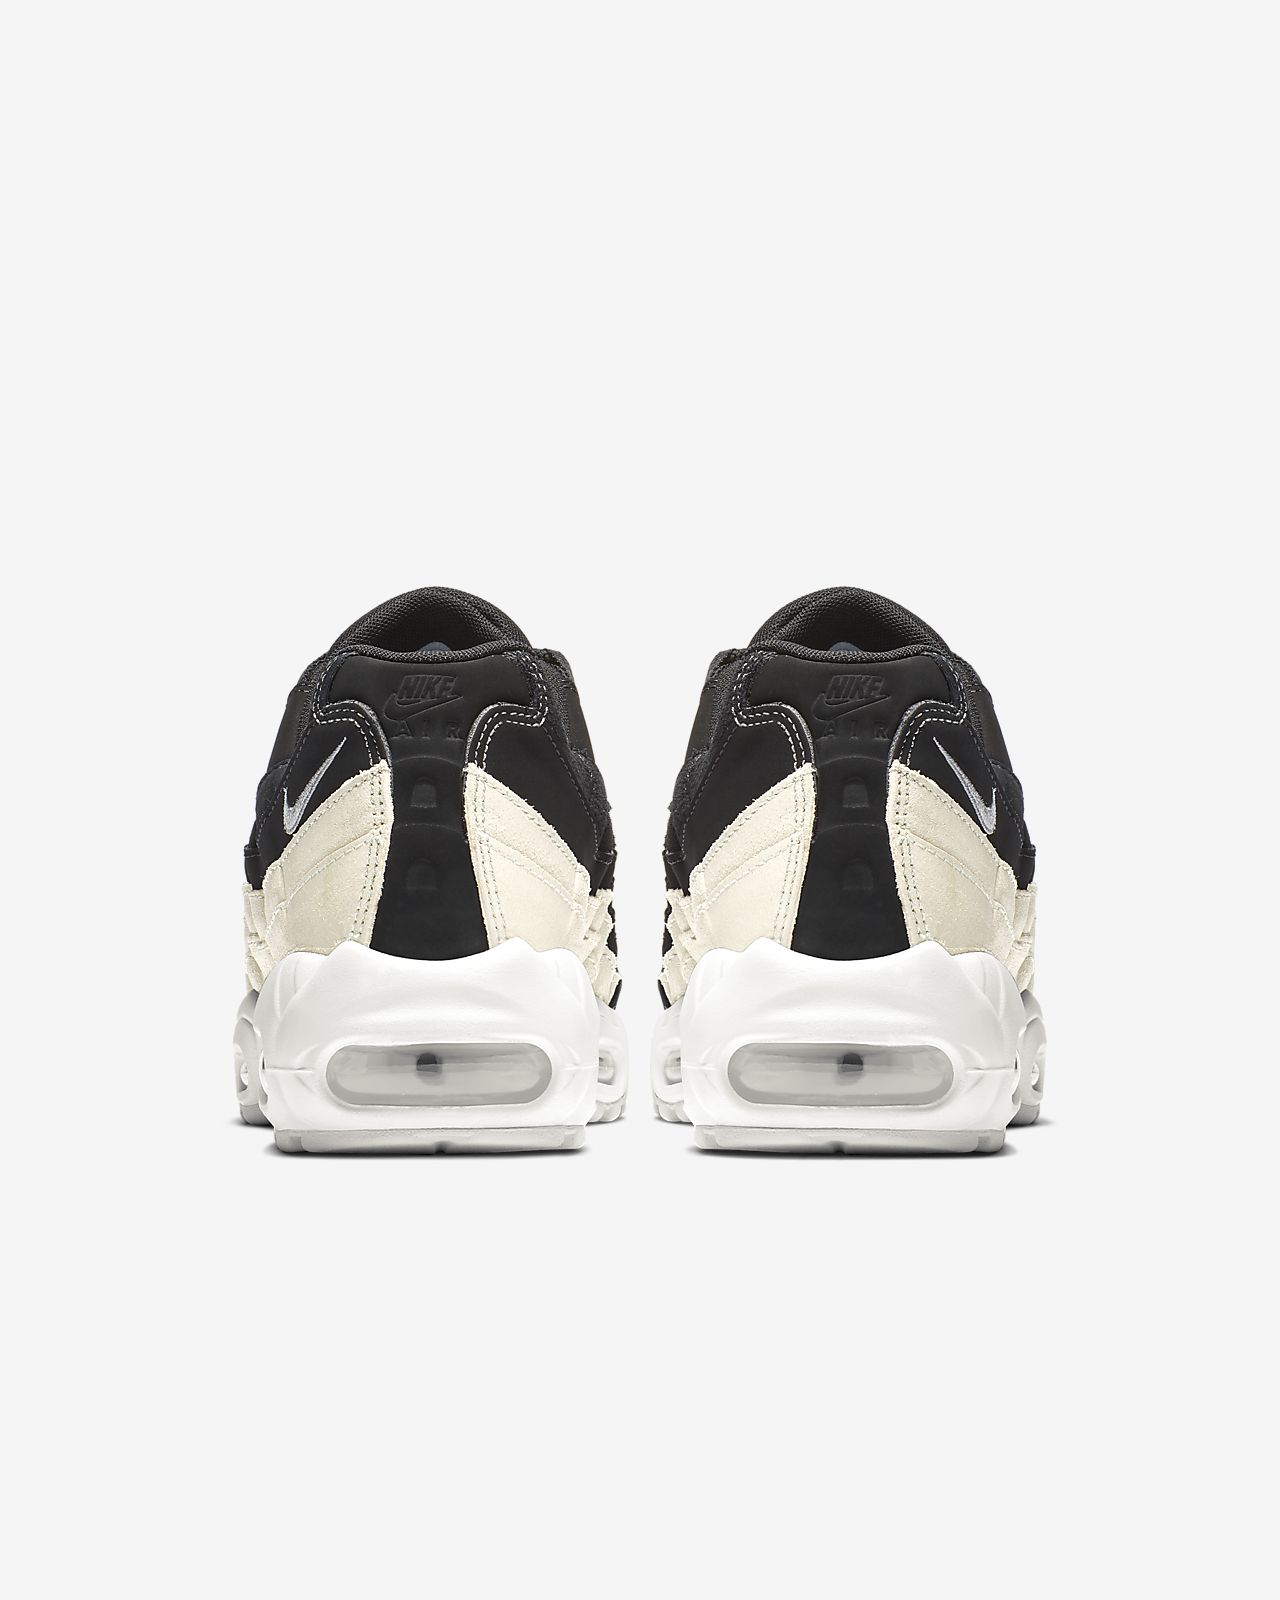 8c25176857 Nike Air Max 95 Premium Women's Shoe. Nike.com